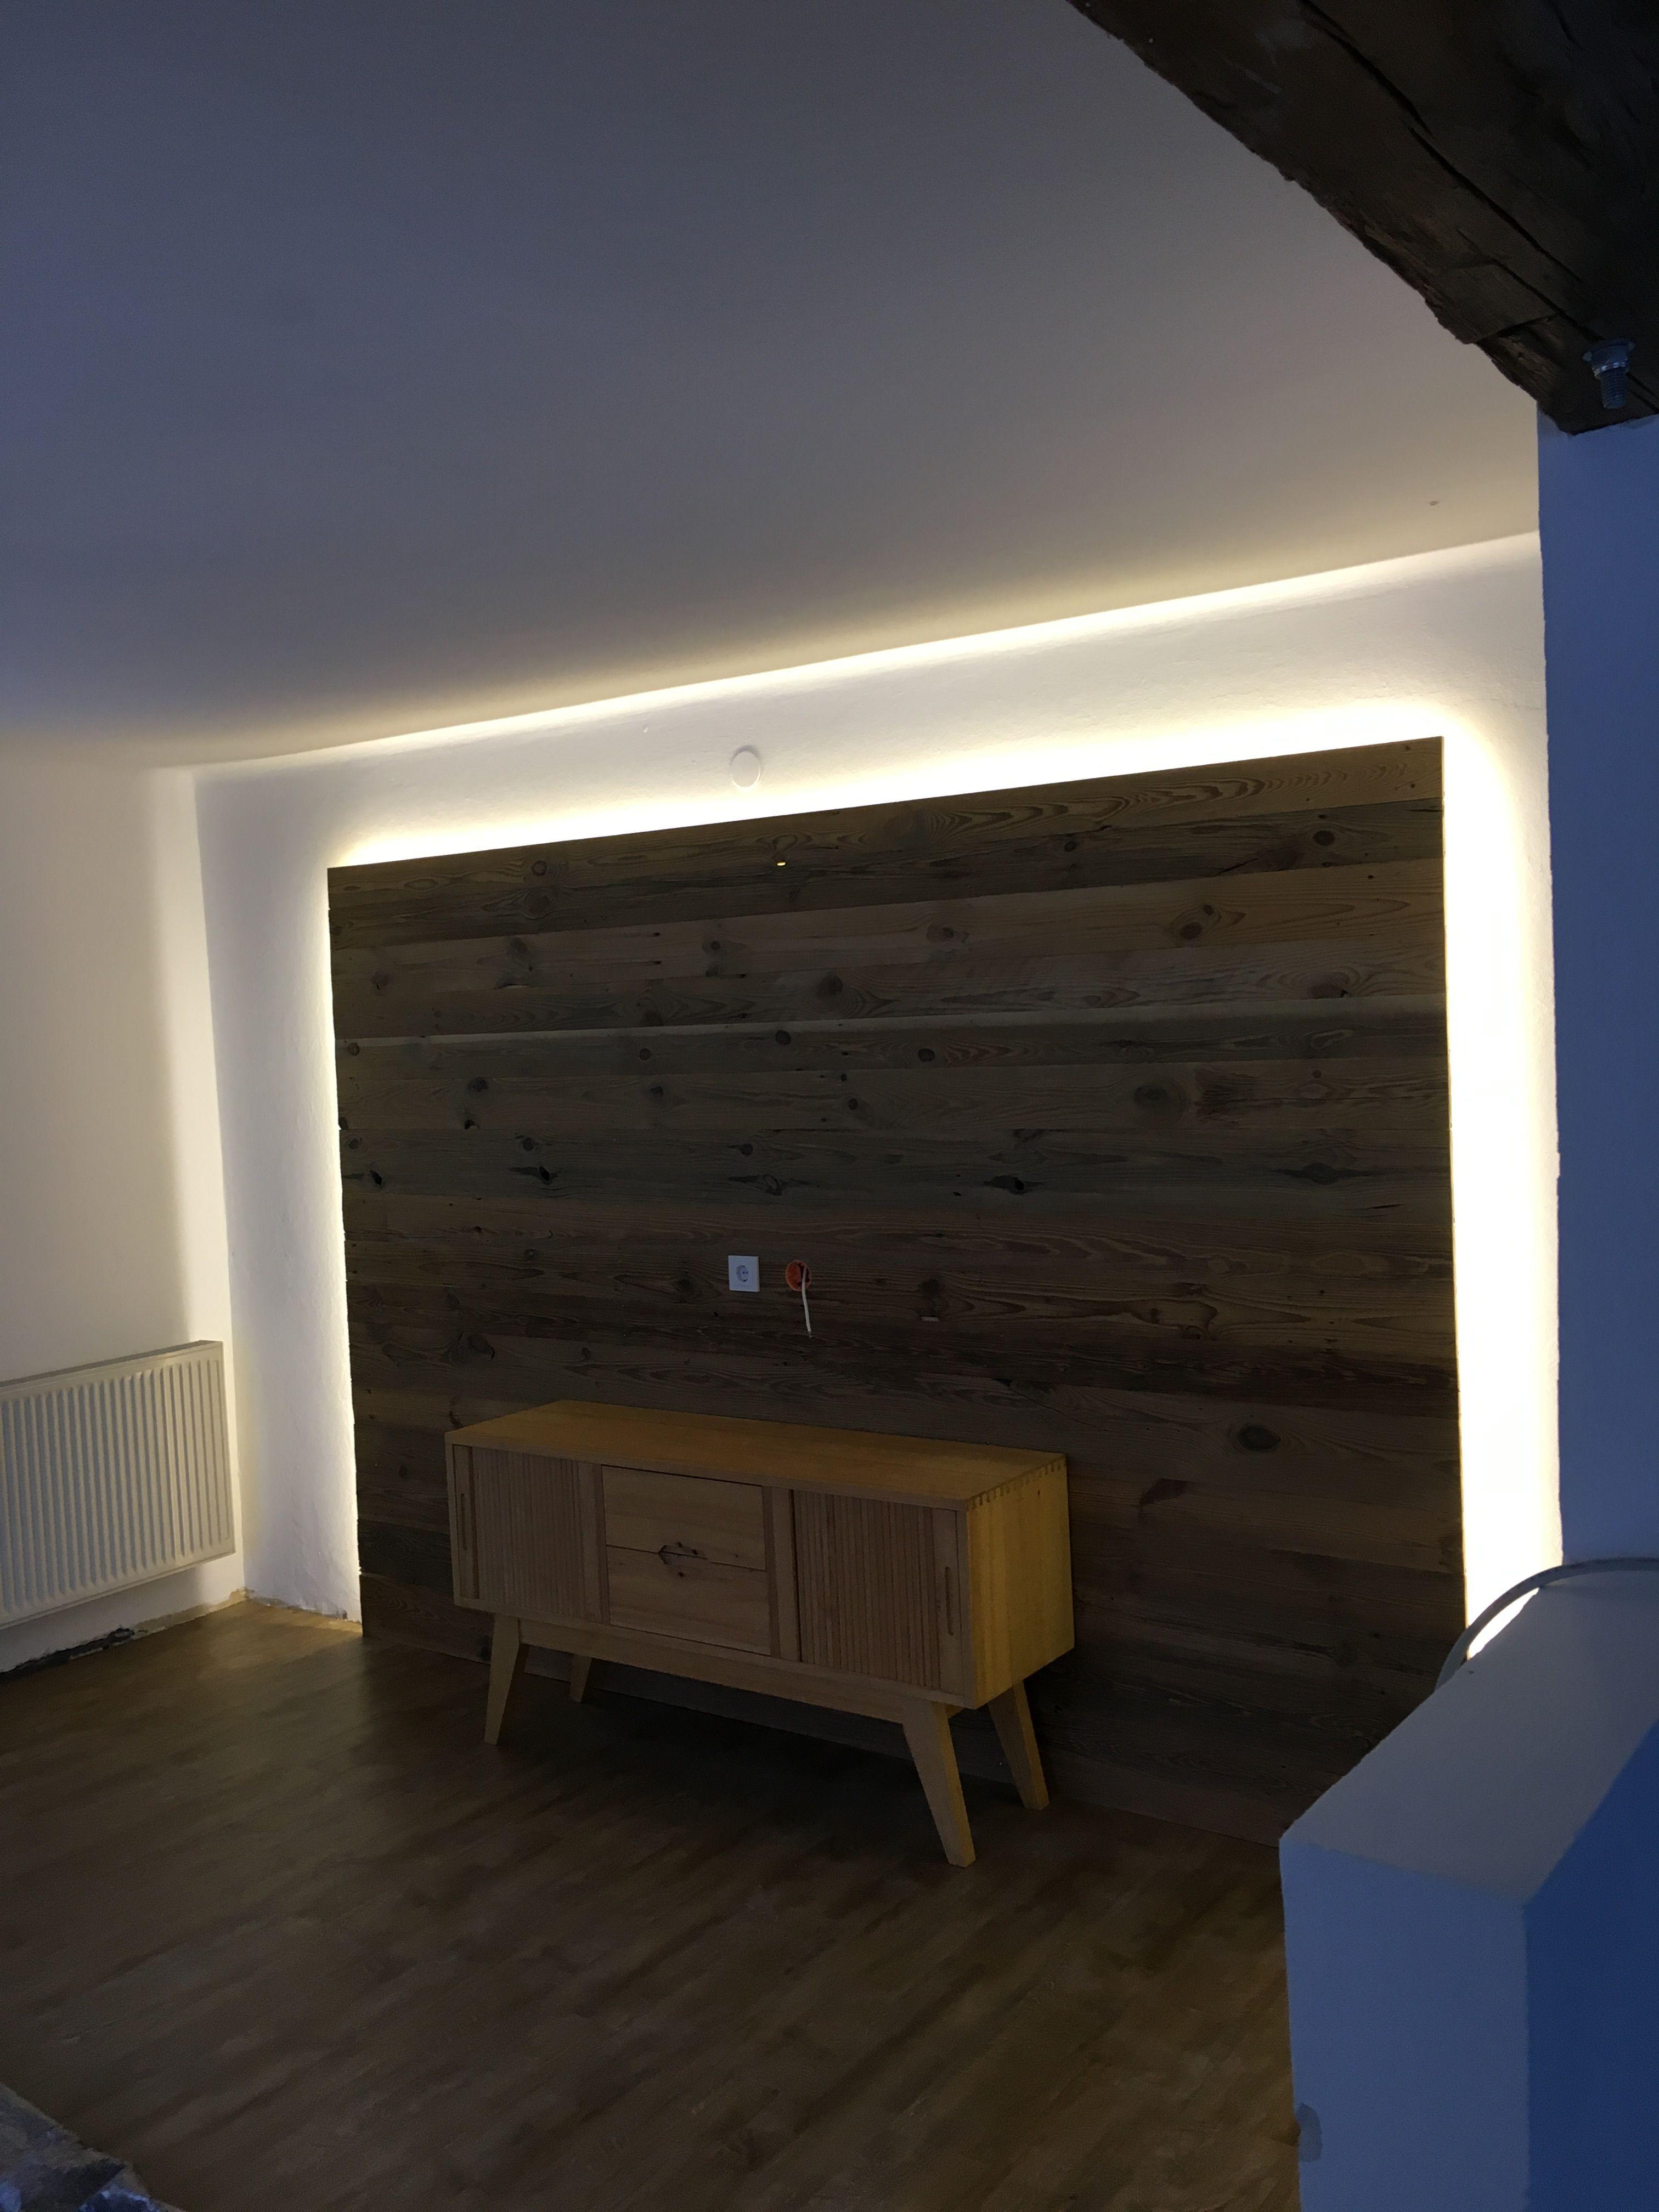 Altholzwand Mit Led Beleuchtung Altholz Wandverkleidung Altholz Wandverkleidung